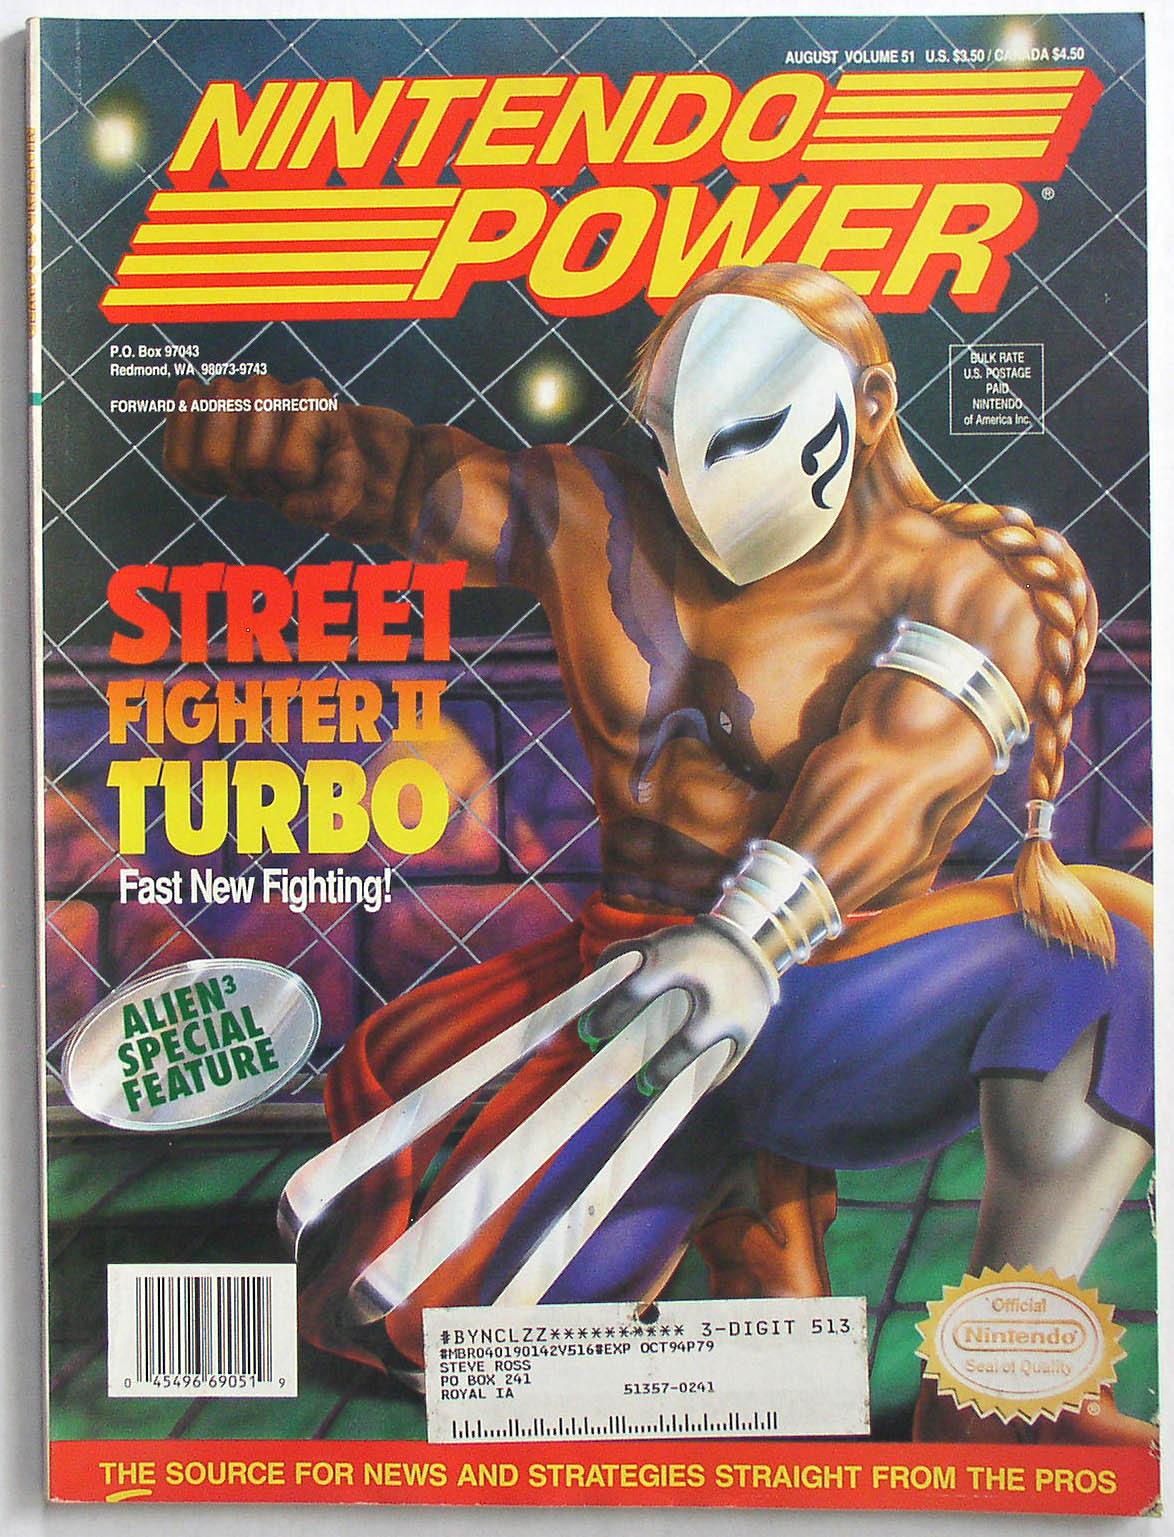 Nintendo Power Magazine Page 2 Thingery Previews